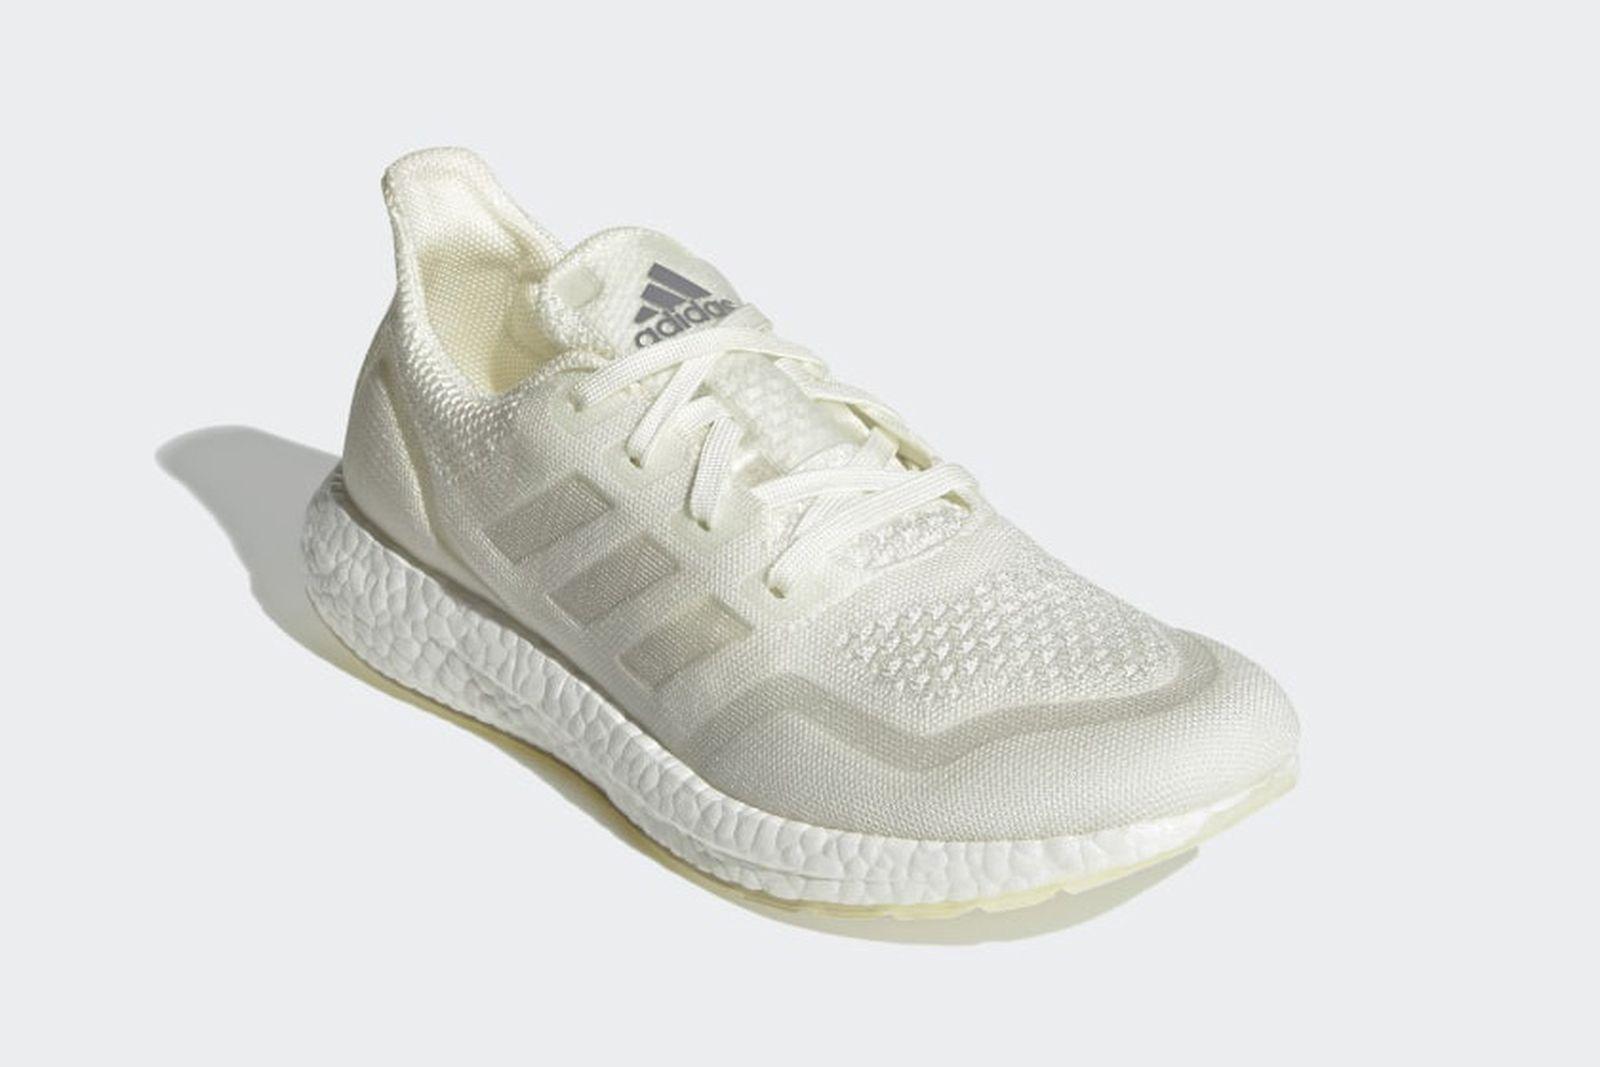 adidas-futurecraft-loop-release-date-price-1-04